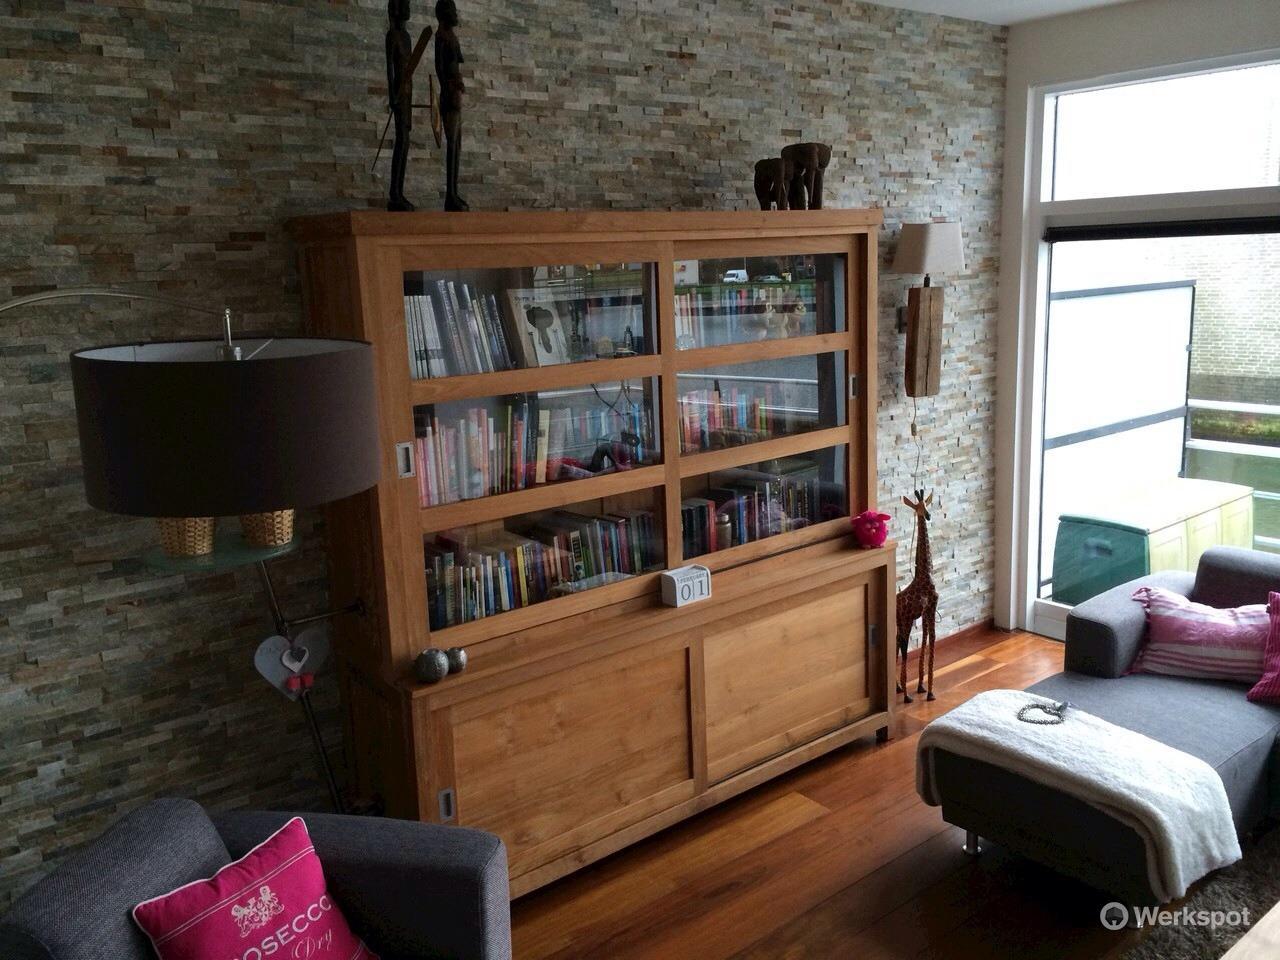 Steenstrips ca. 5 x 3 m2 op gladde muur in woonkamer - Werkspot